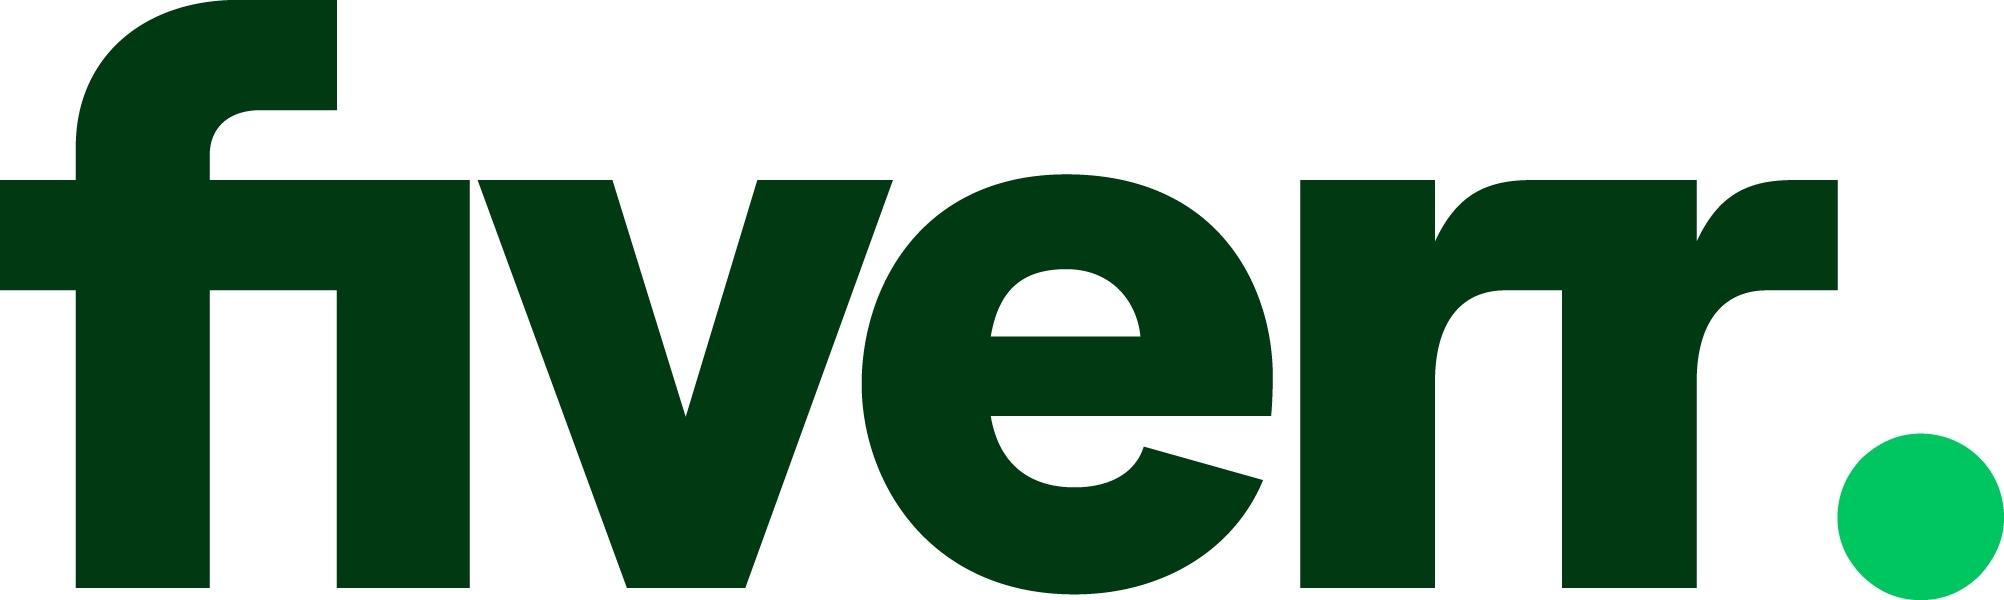 [Image: Fiverr_Logo_GreenGreen_RGB.jpg]